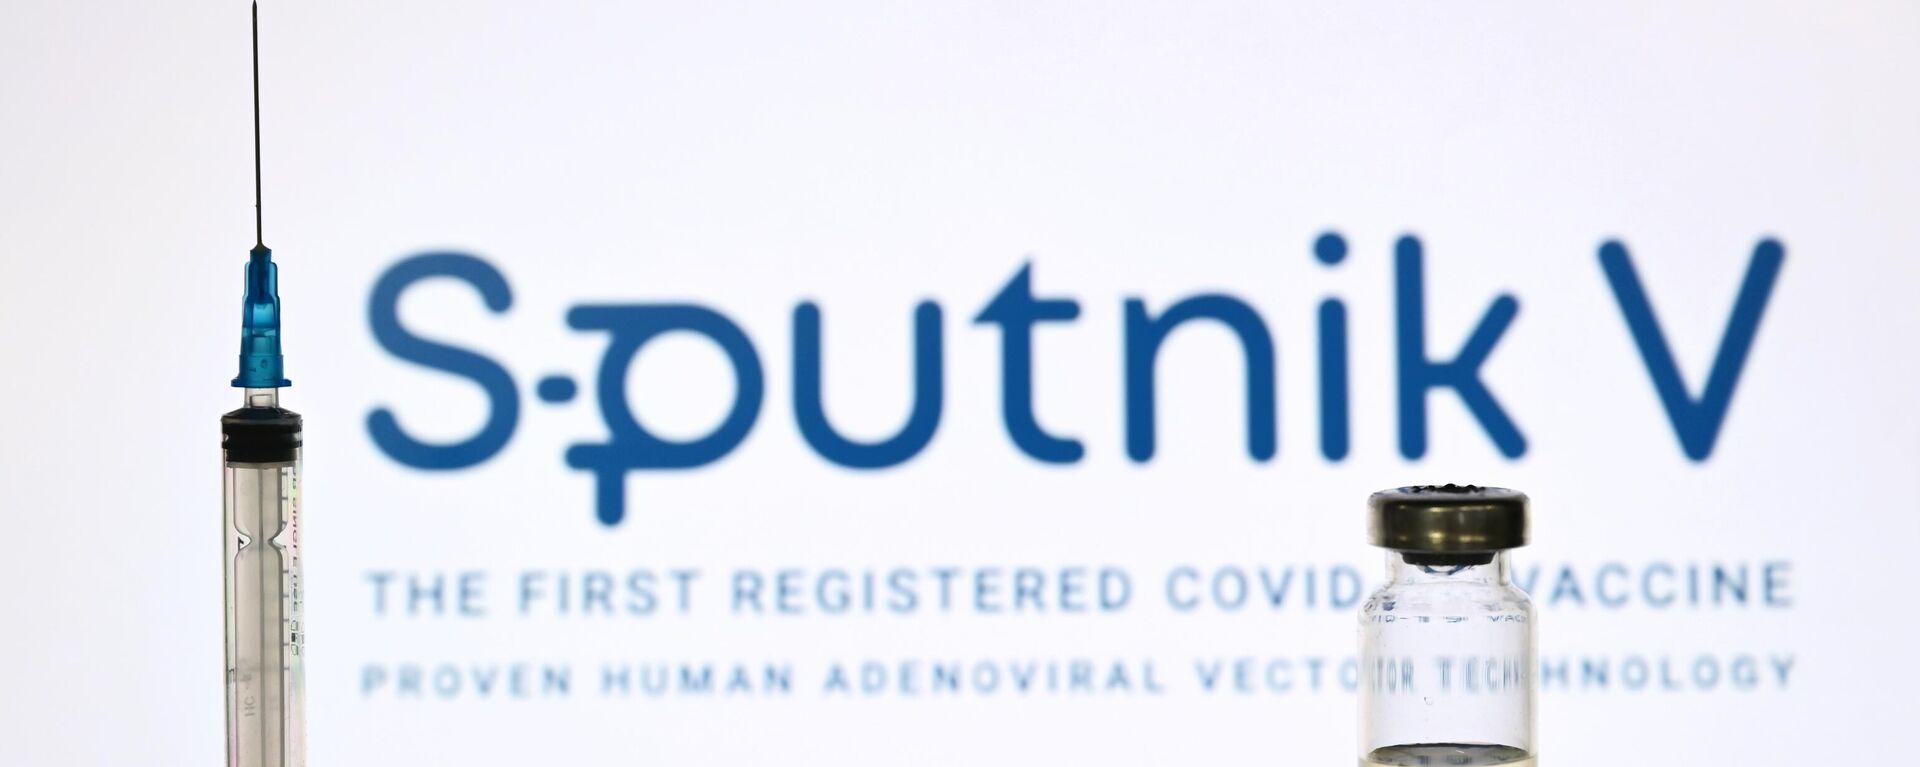 La vacuna contra el coronavirus Sputnik V - Sputnik Mundo, 1920, 12.05.2021